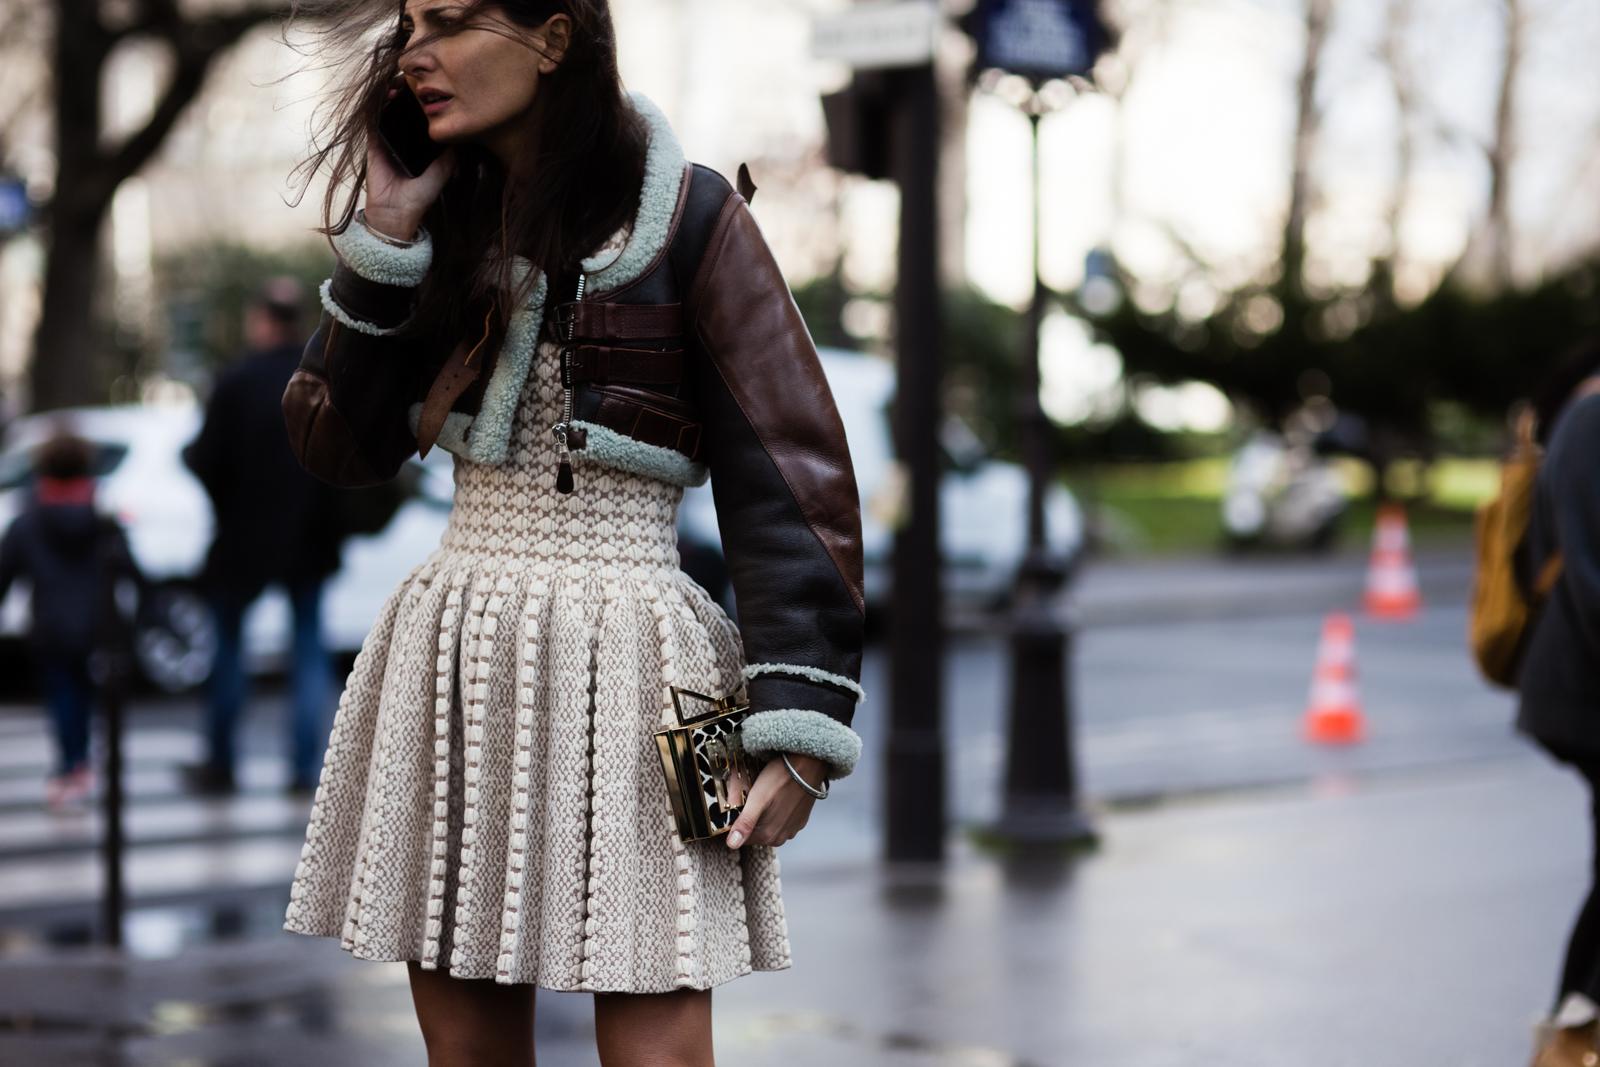 ShotByGio-George-Angelis-Giovanna_Battaglia-Paris-Fashion-Week-Fall-Winter-2016-2017-Street-Style-5622.jpg